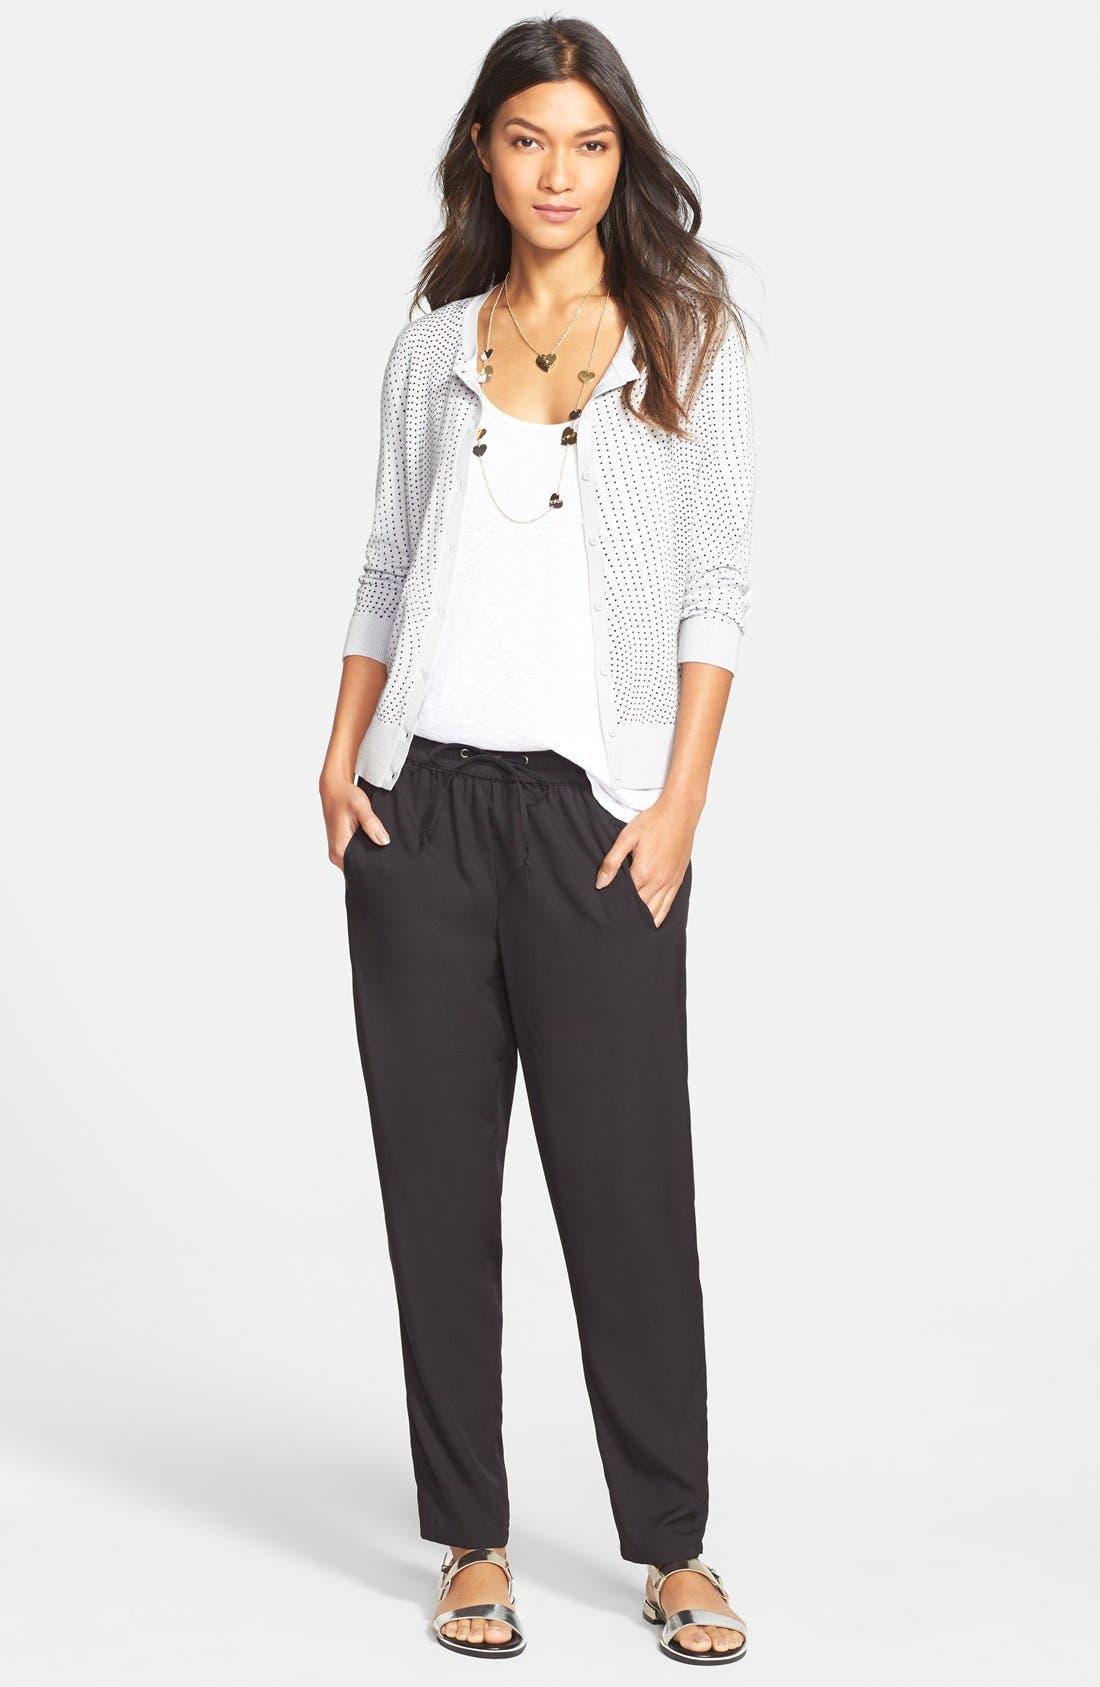 Halogen® Cardigan, LAmade Tank & Jessica Simpson Pants